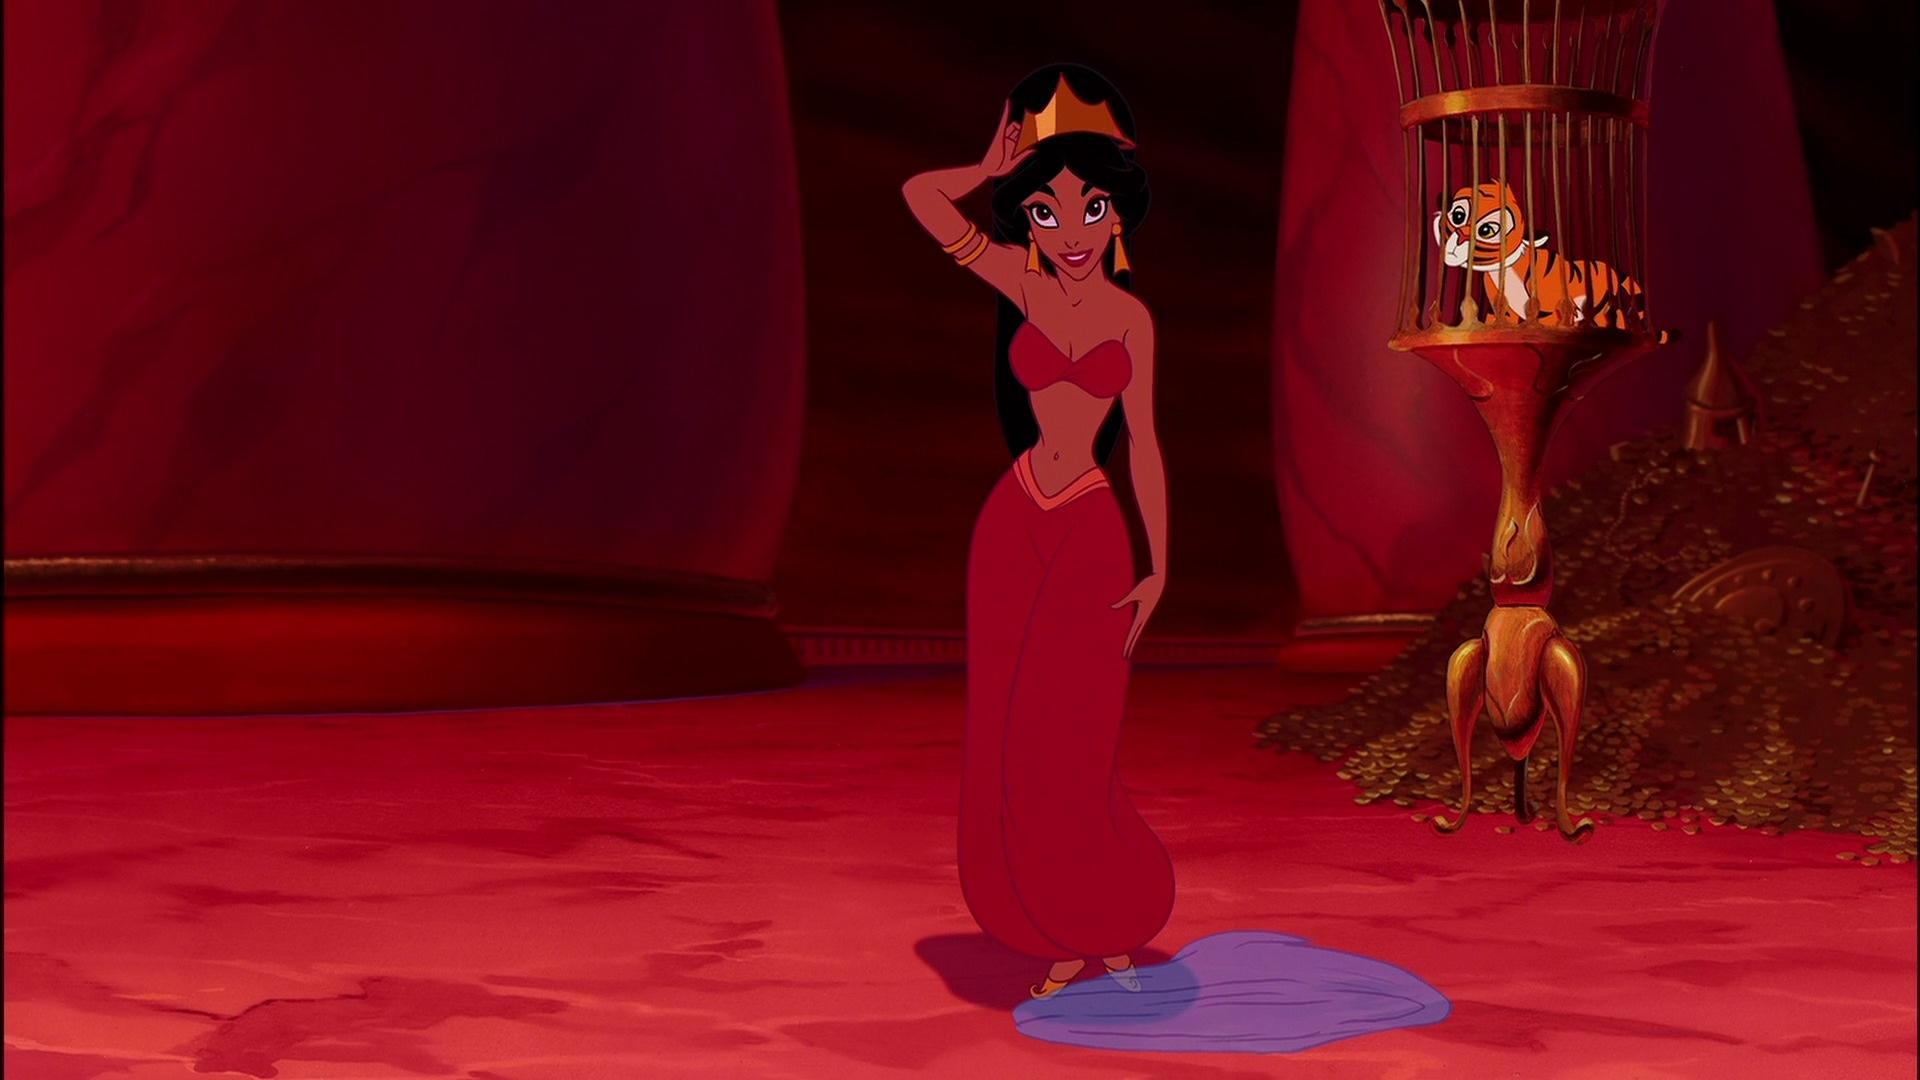 princess jasmine red outfit scene